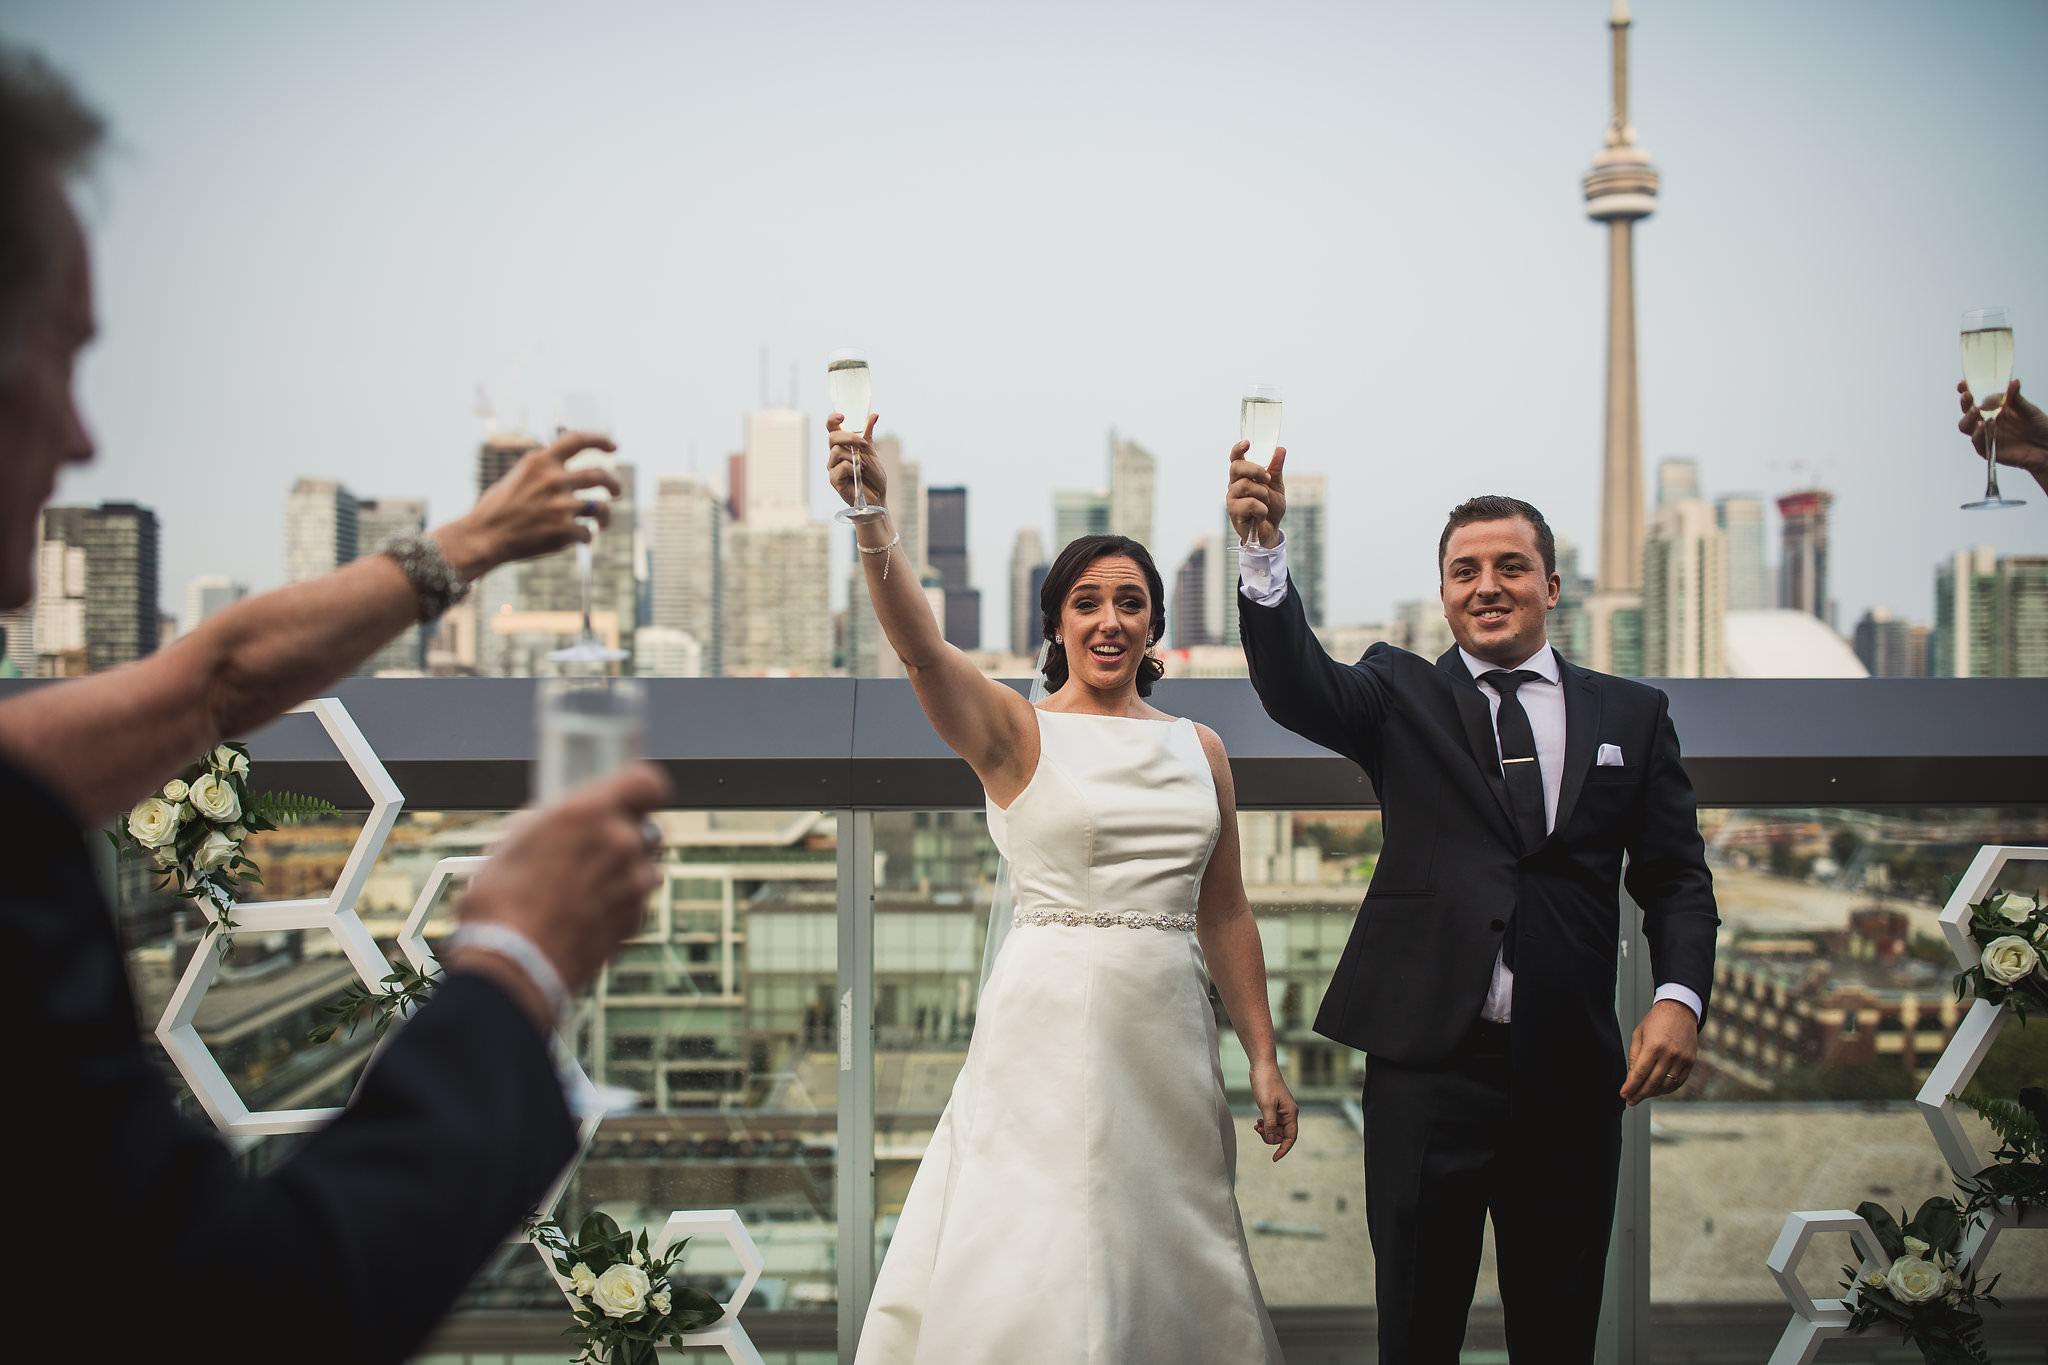 Cristin Rob Thompson Hotel Wedding Photos 564 - Thompson Hotel Wedding Photos